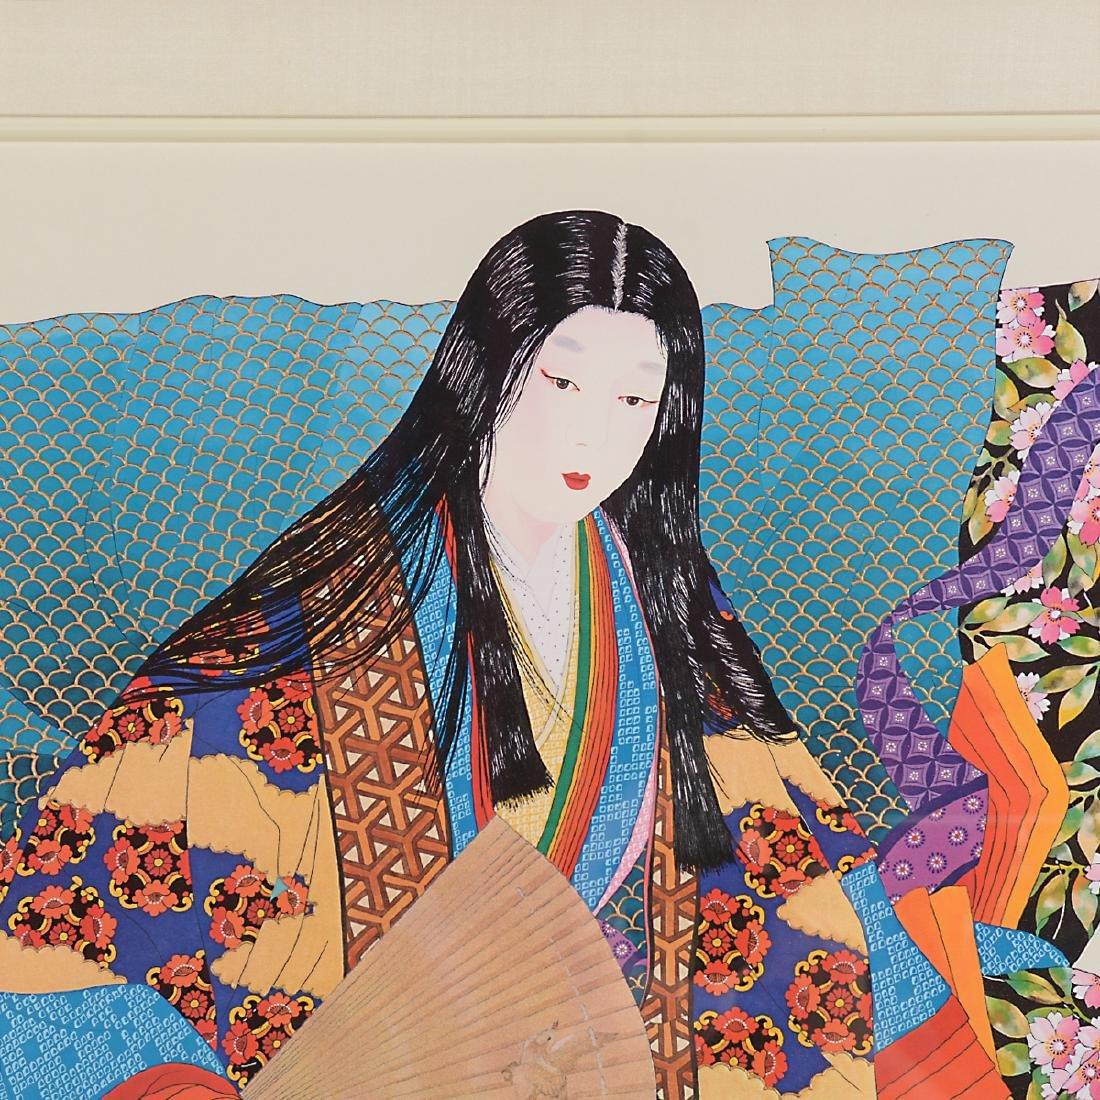 Hisashi Otsuka (b. 1947): The 36th Poetess - 2